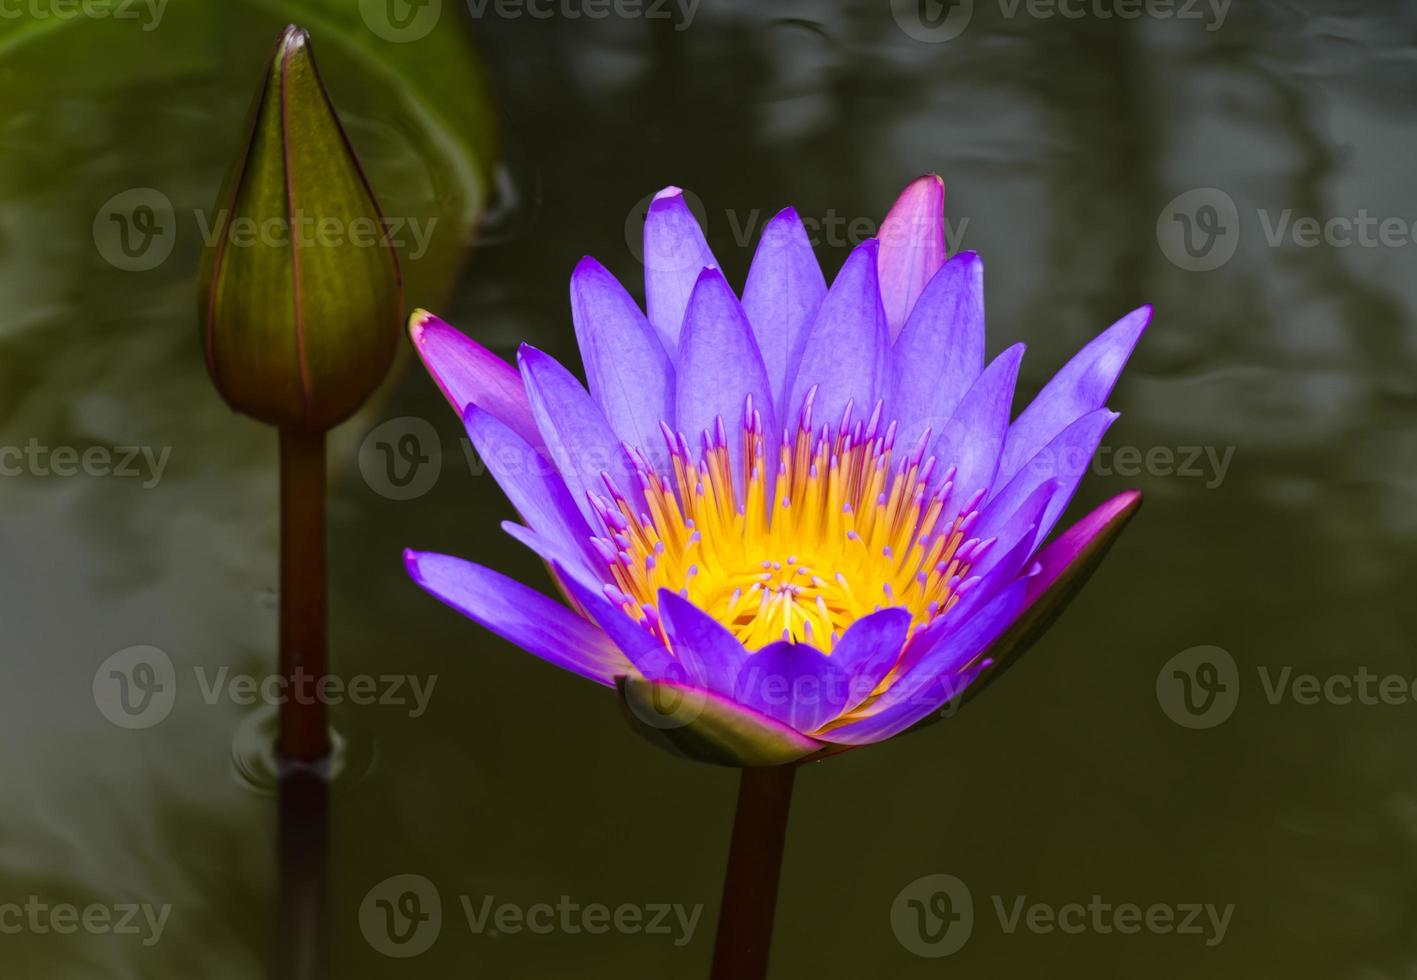 fiore di loto viola foto